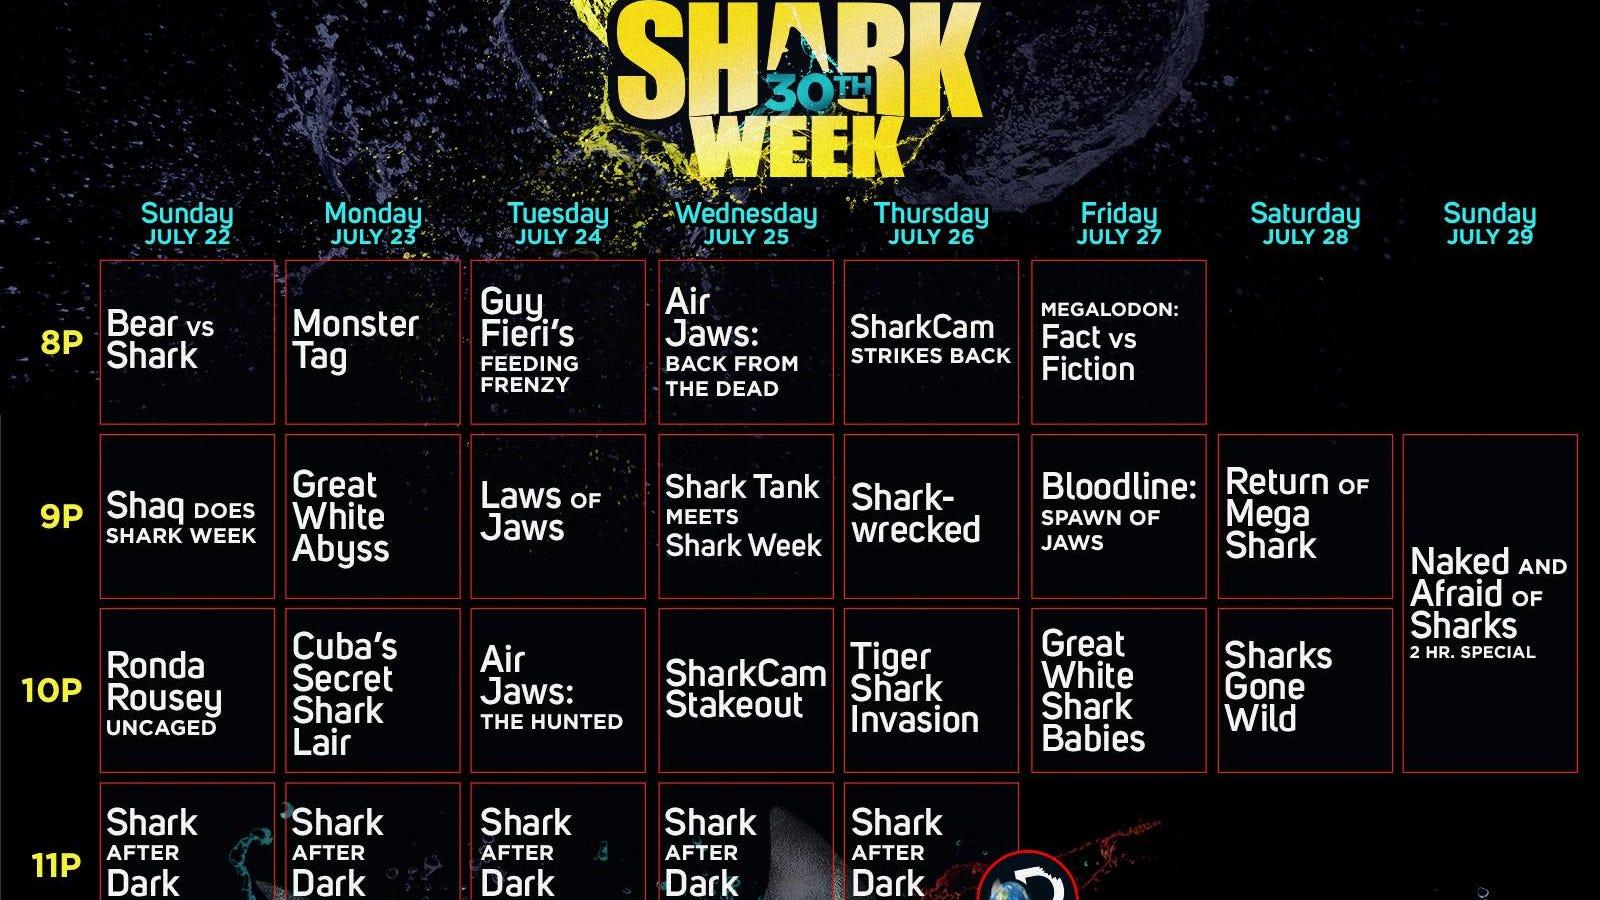 shark-week-schedule.jpg